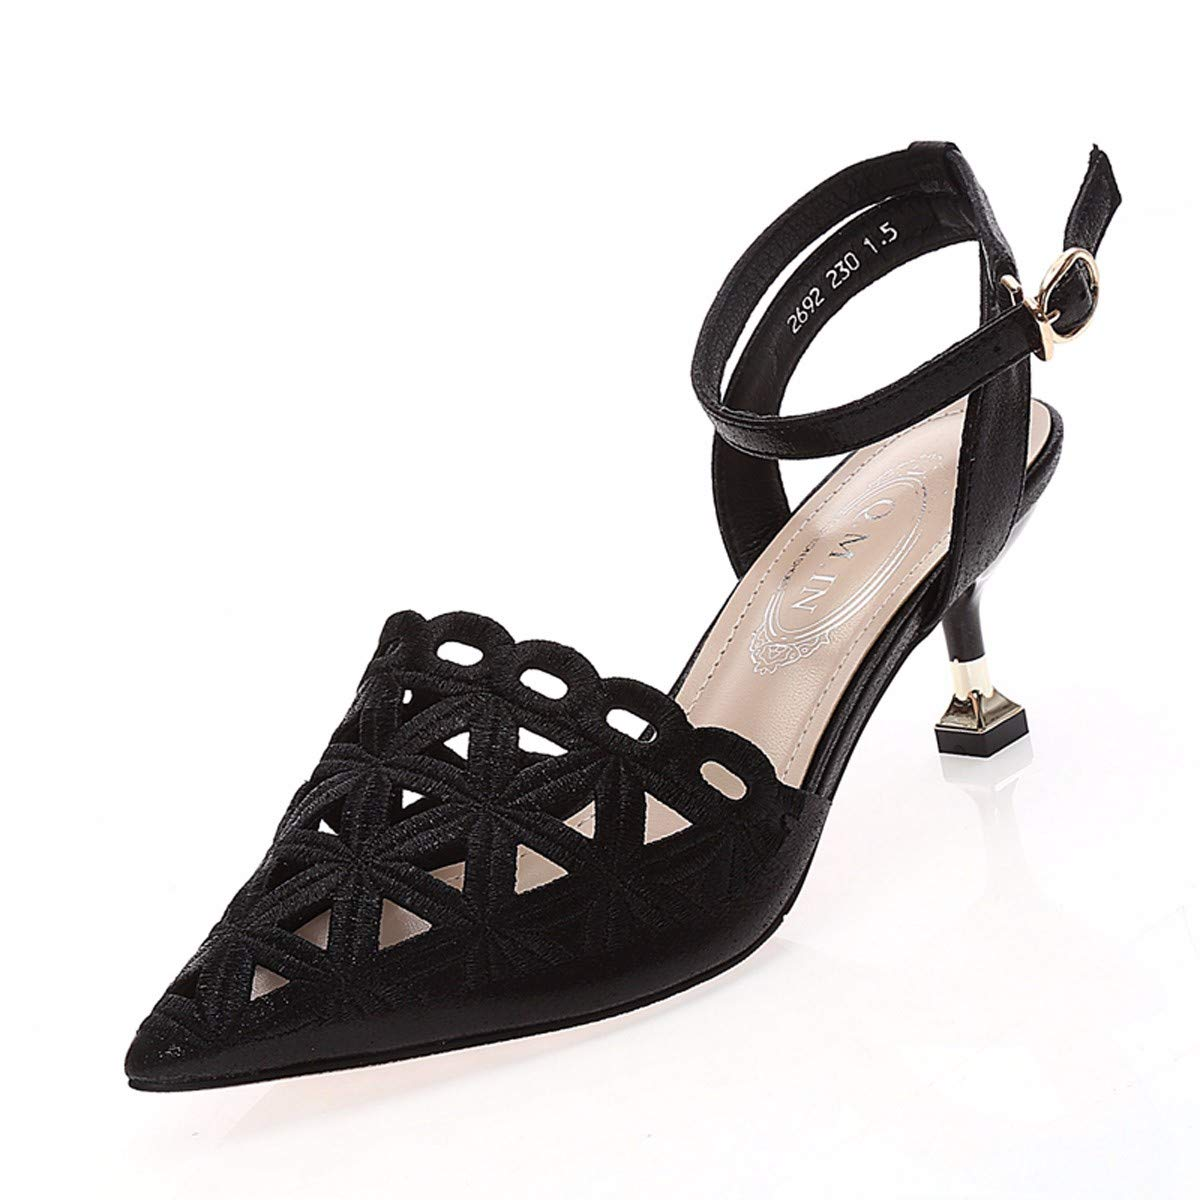 HBDLH HBDLH HBDLH Damenschuhe Im Sommer Damen-Spitzen Ausgehöhlt 6 cm Hochhackigen Sandalen Leere Säcke Dünnen Schuhen. 67b836